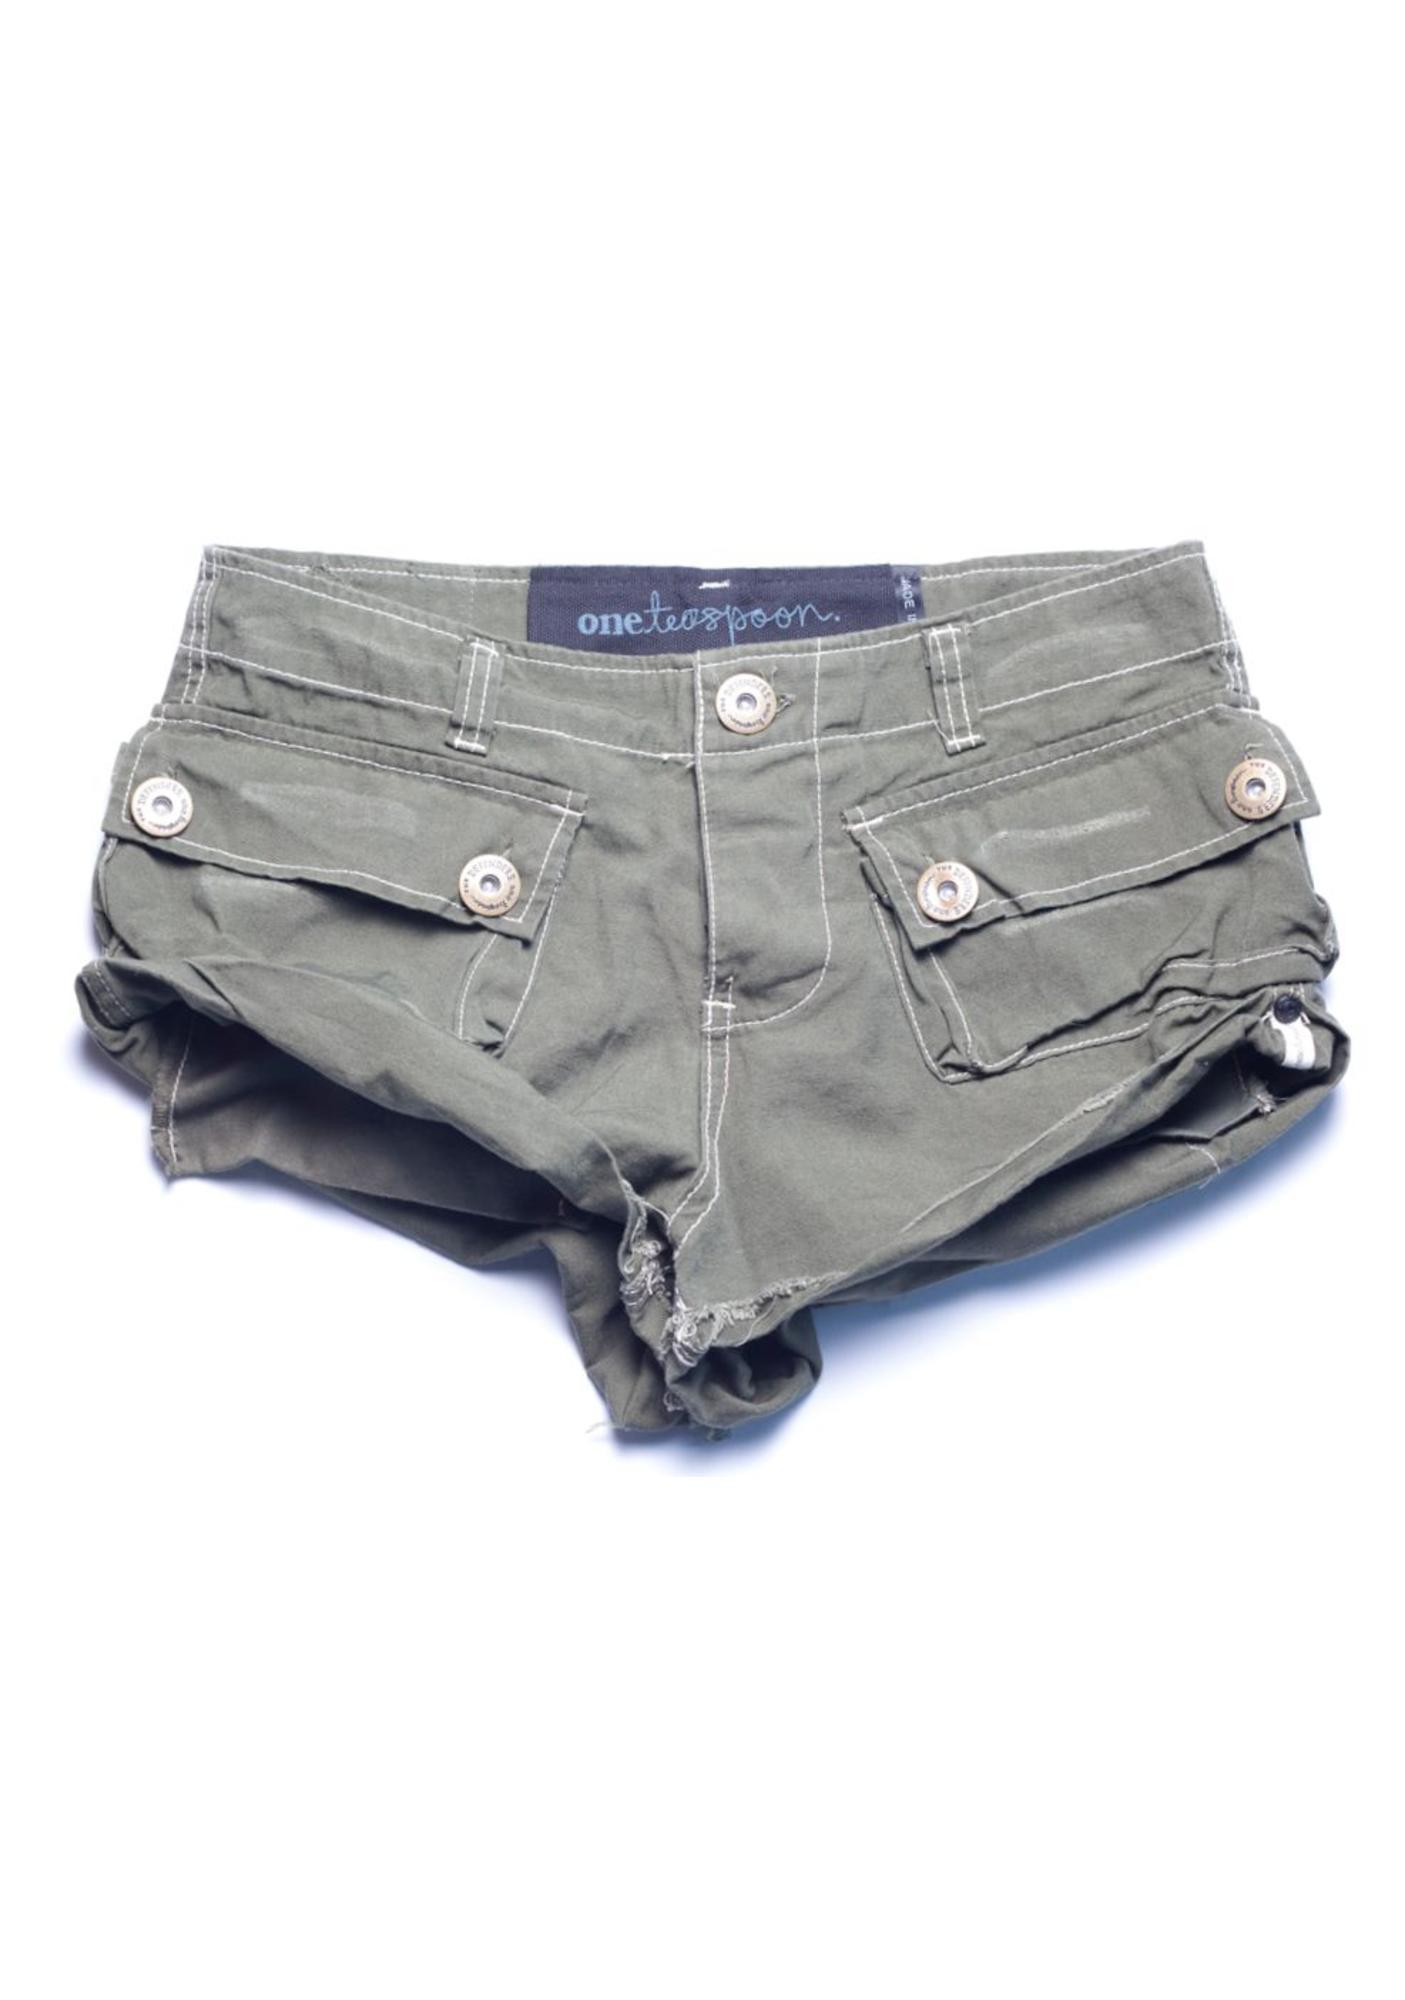 One Teaspoon Defender Shorts